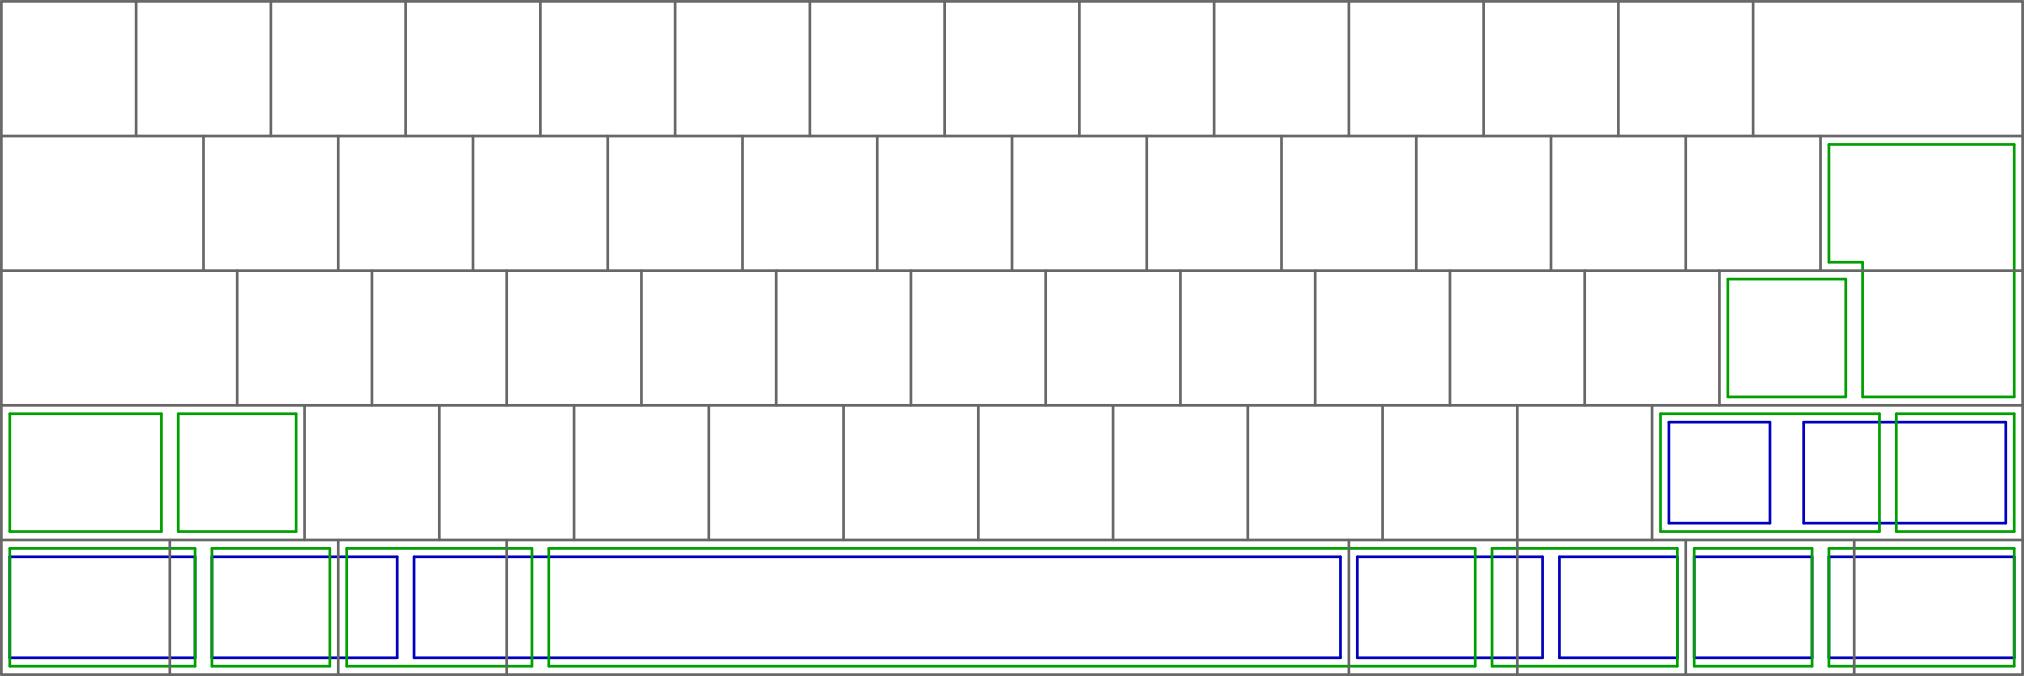 Introducing the GH60 keyboard project | komar's techblog